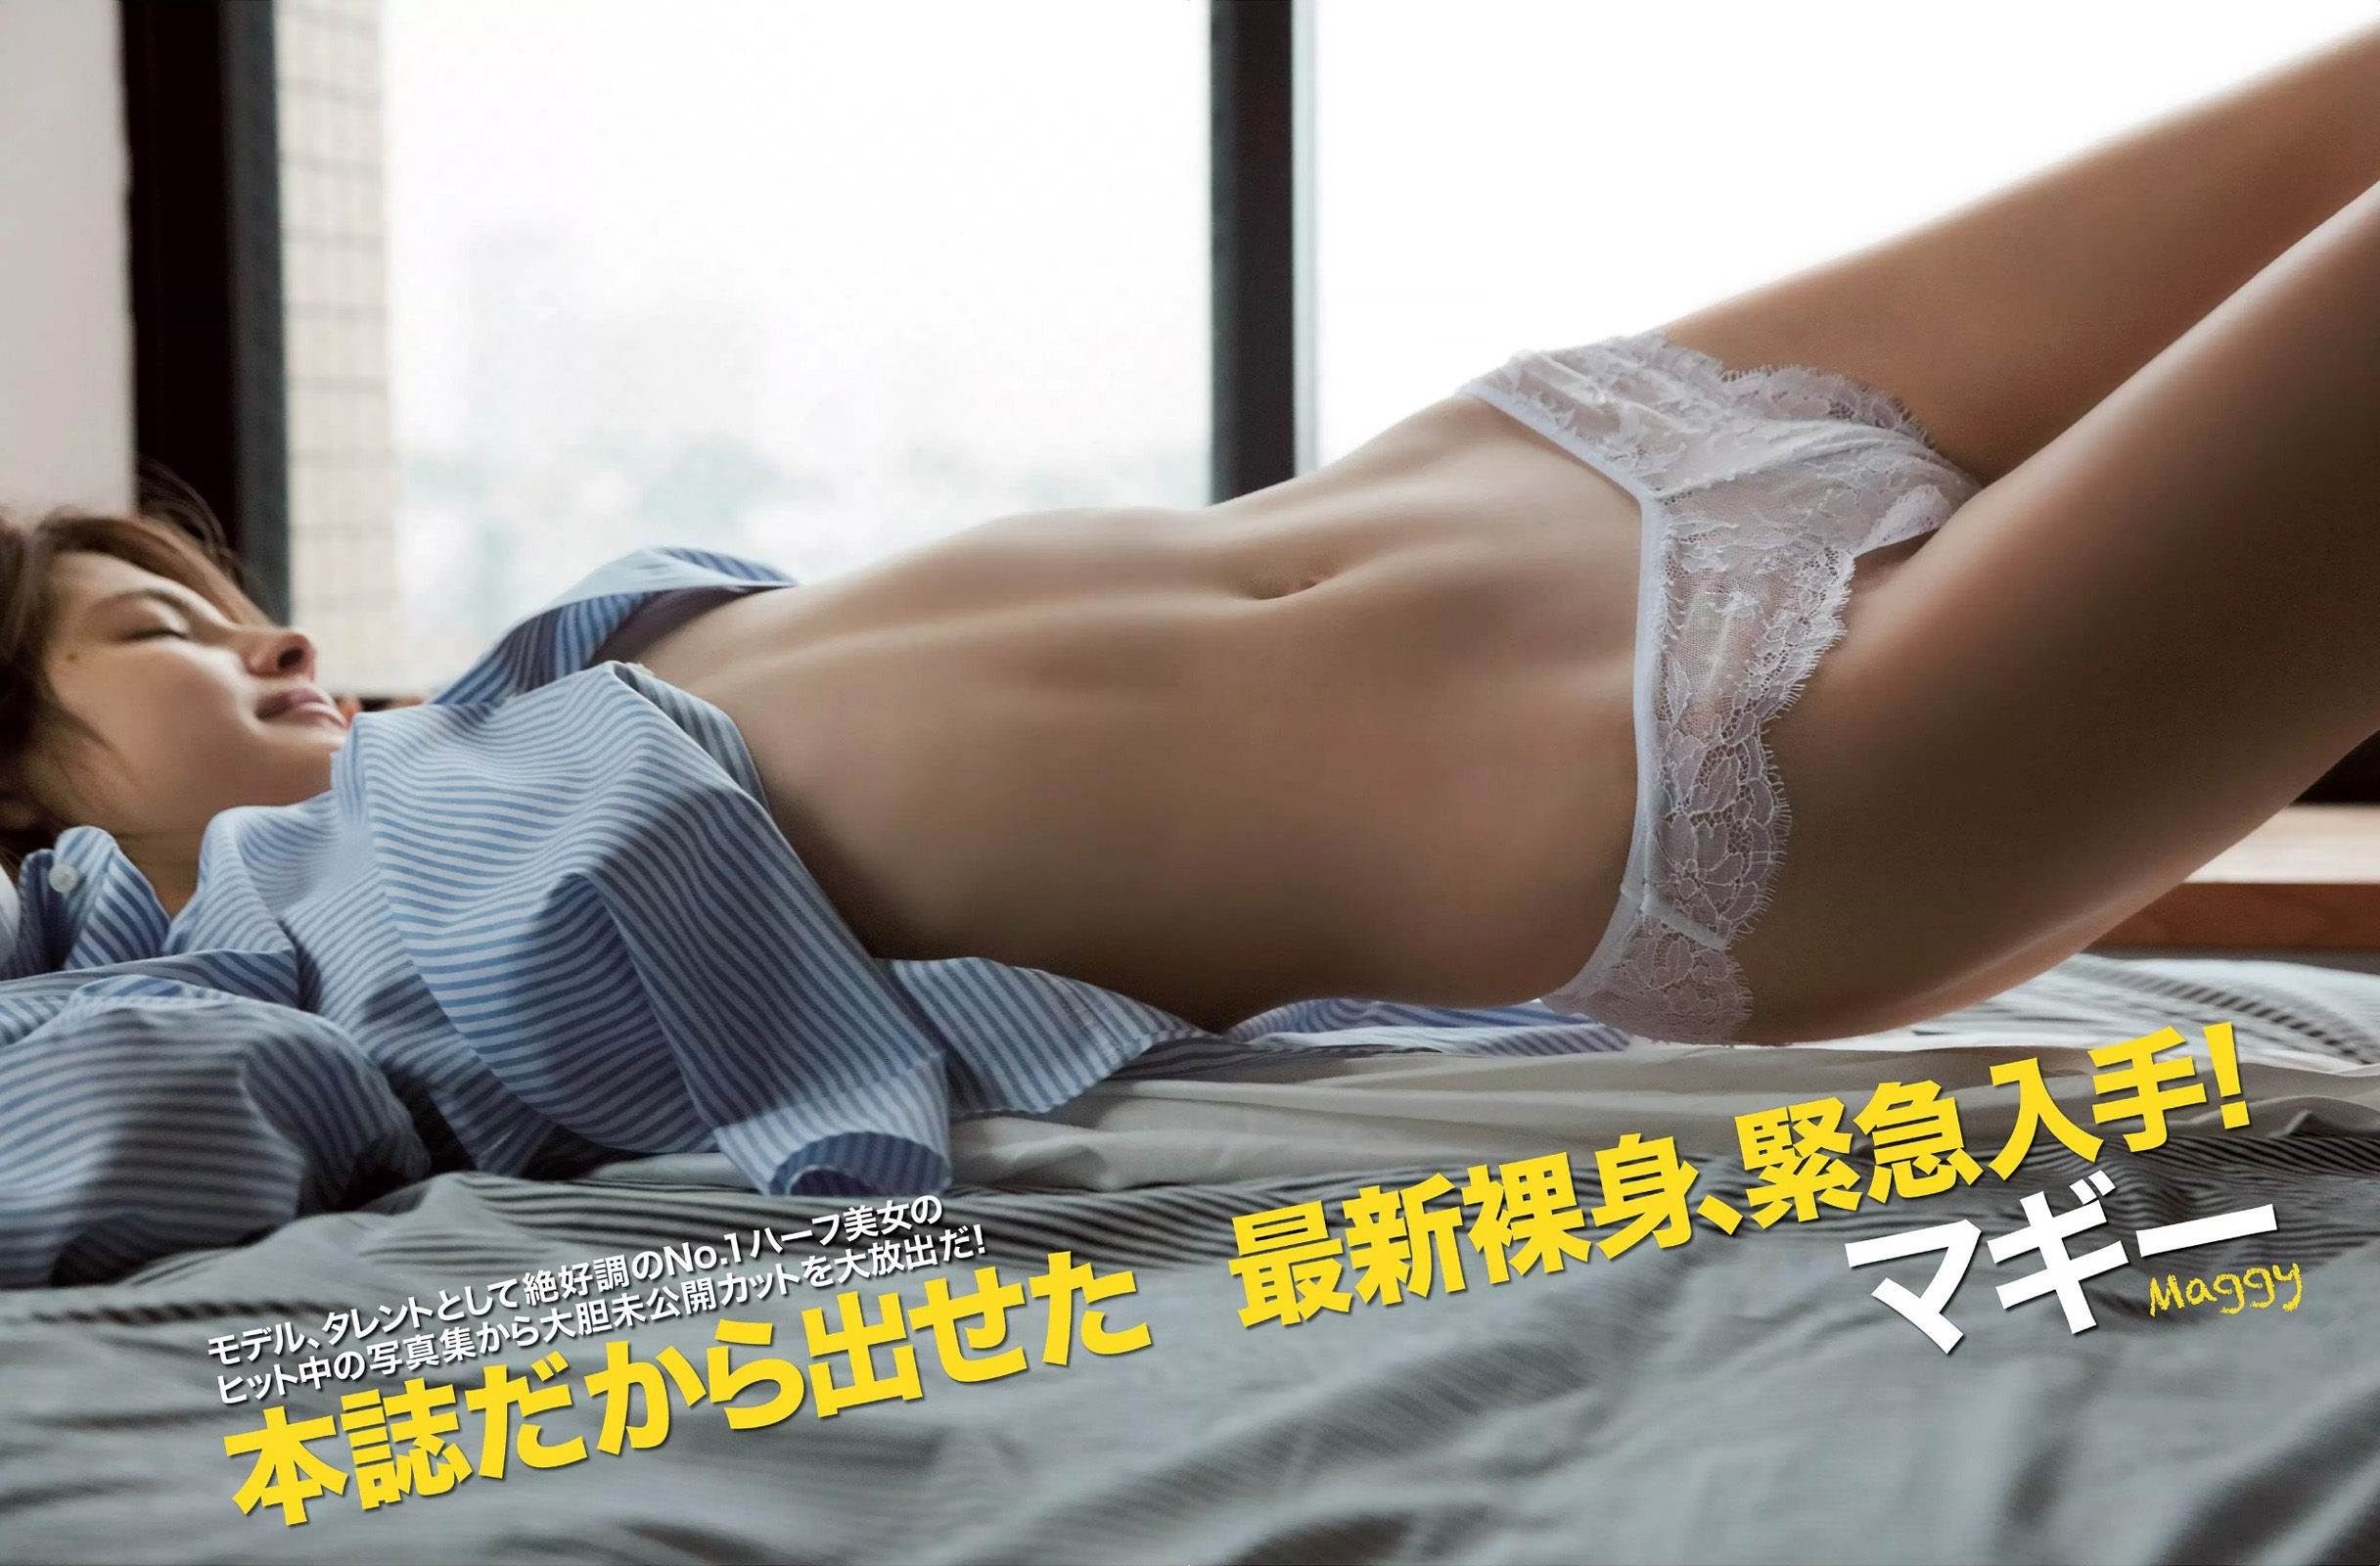 マギー パンツ1枚でマンスジが透けてる件☆☆wwwwwwwwwwwwww